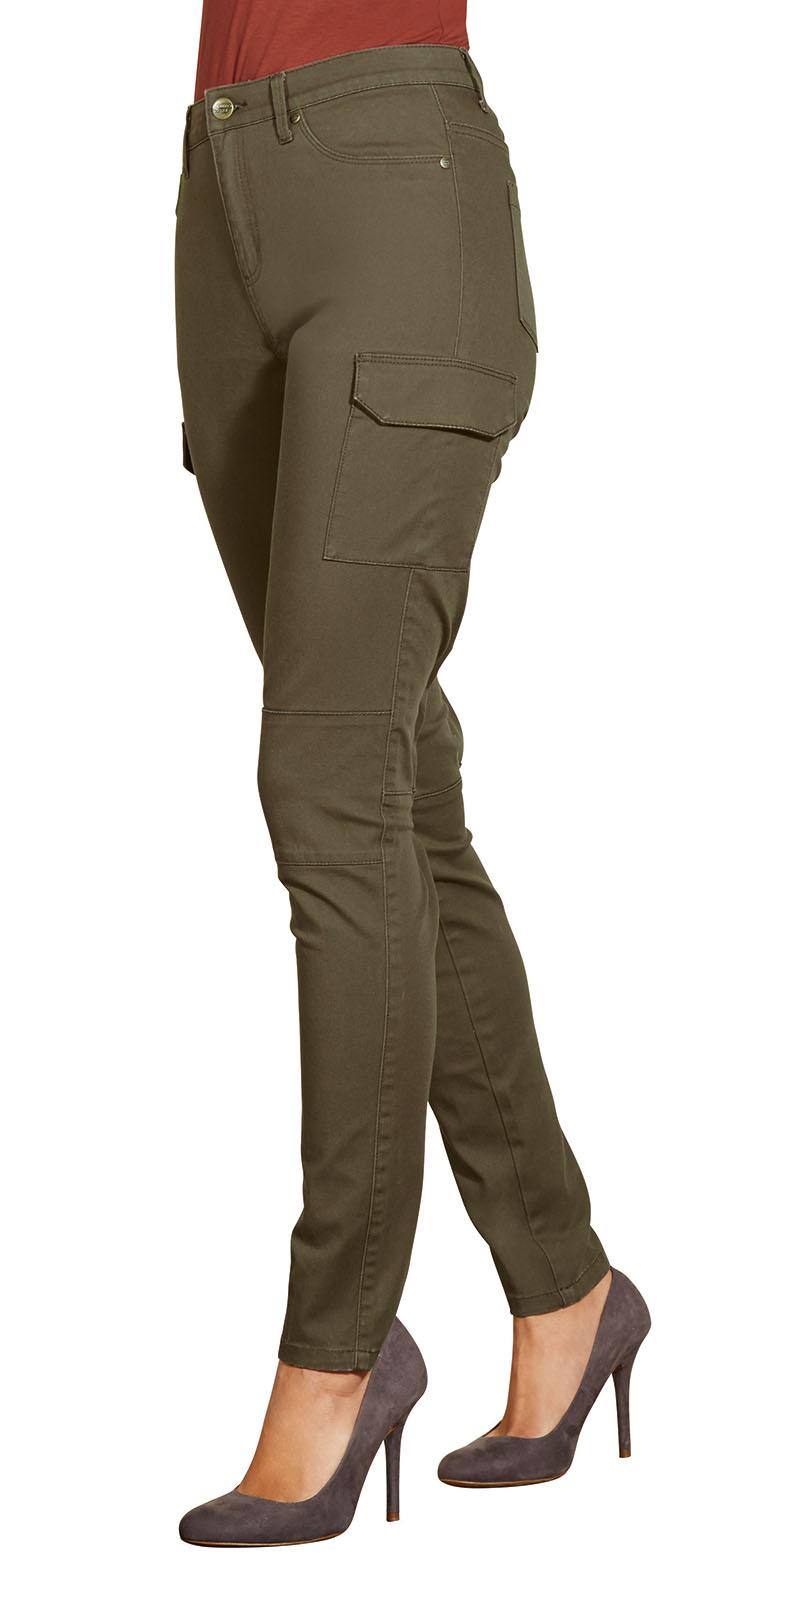 khaki hose damen damen hose khaki fashion korb whole sale. Black Bedroom Furniture Sets. Home Design Ideas